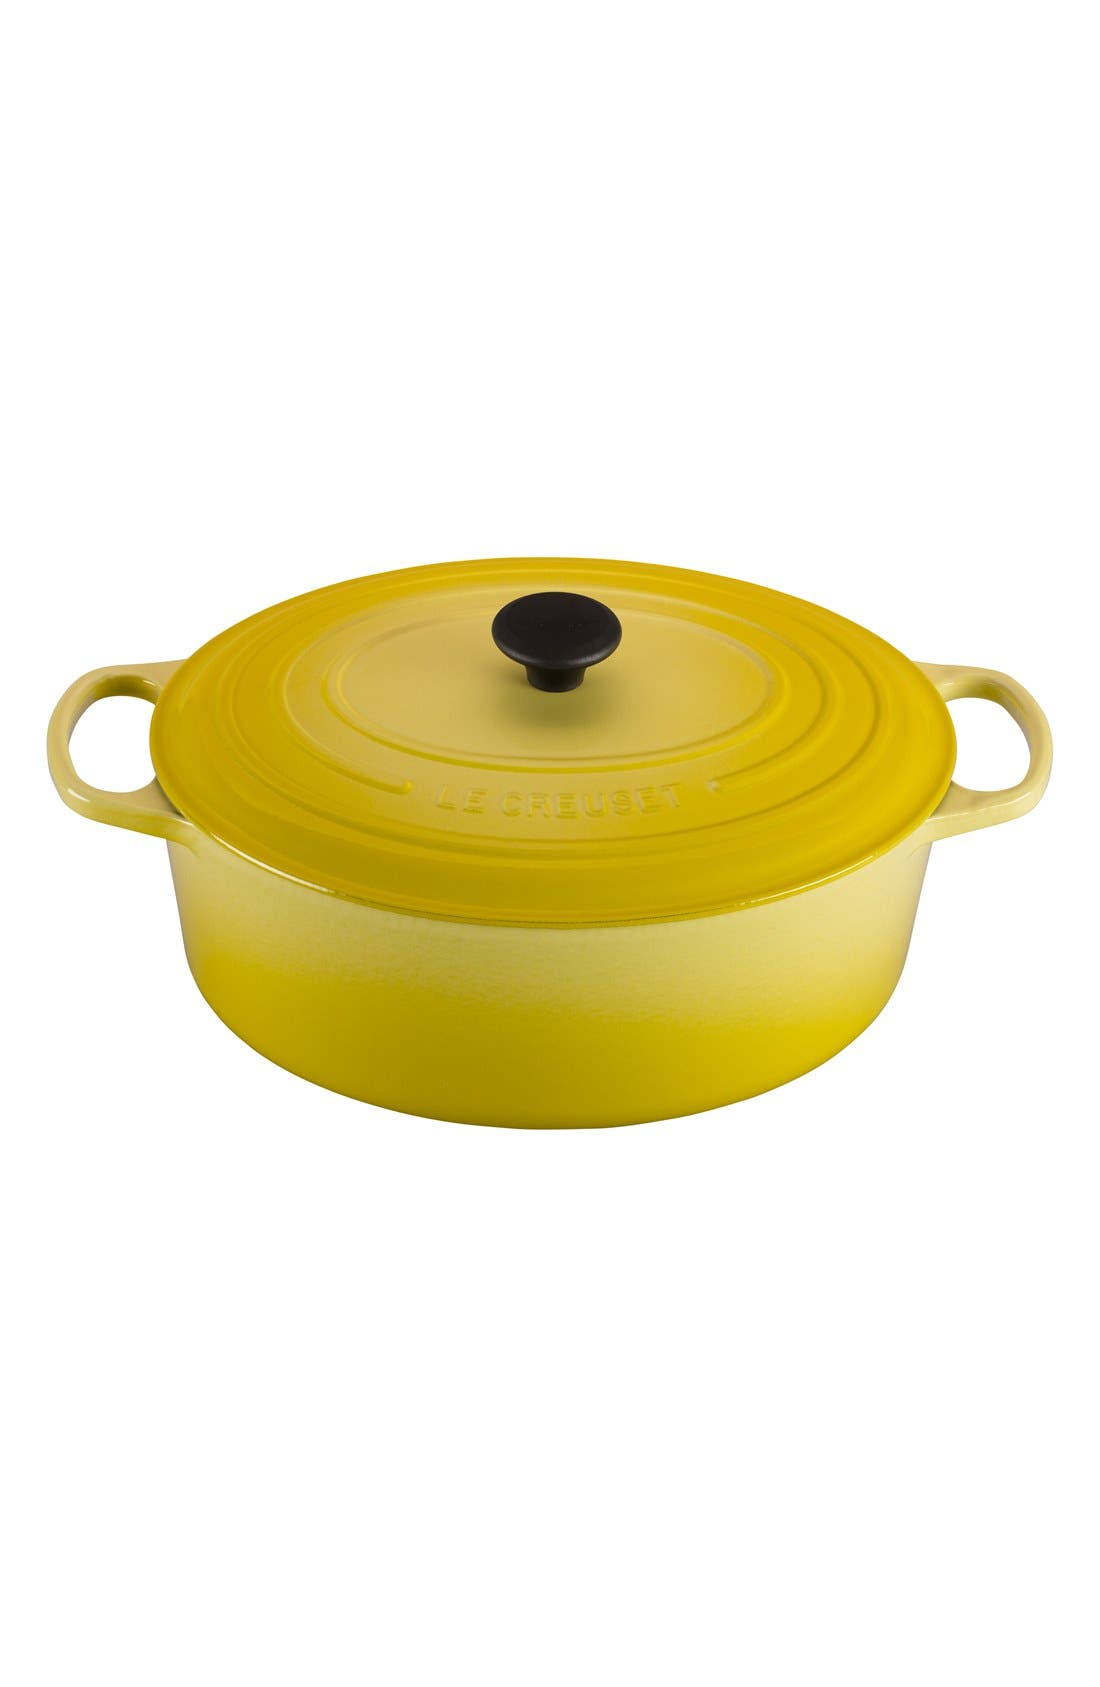 Signature 9 1/2 Quart Oval Enamel Cast Iron French/Dutch Oven,                             Main thumbnail 7, color,